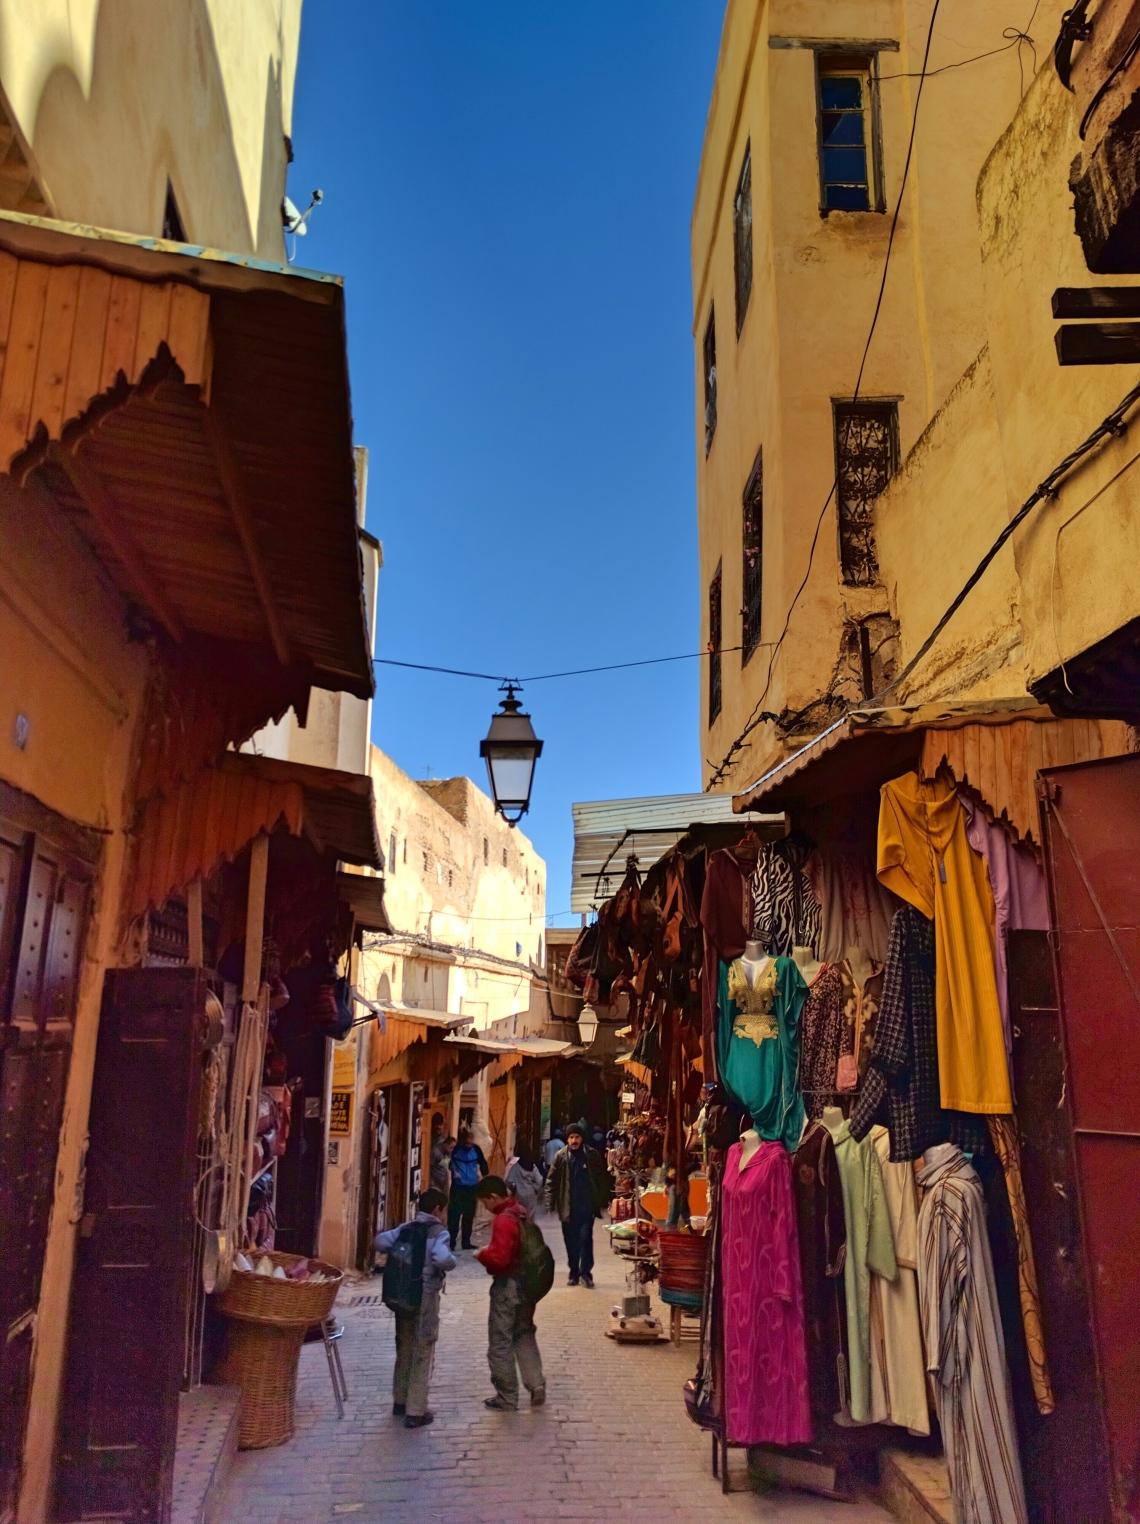 fes_medina_shopping.jpg